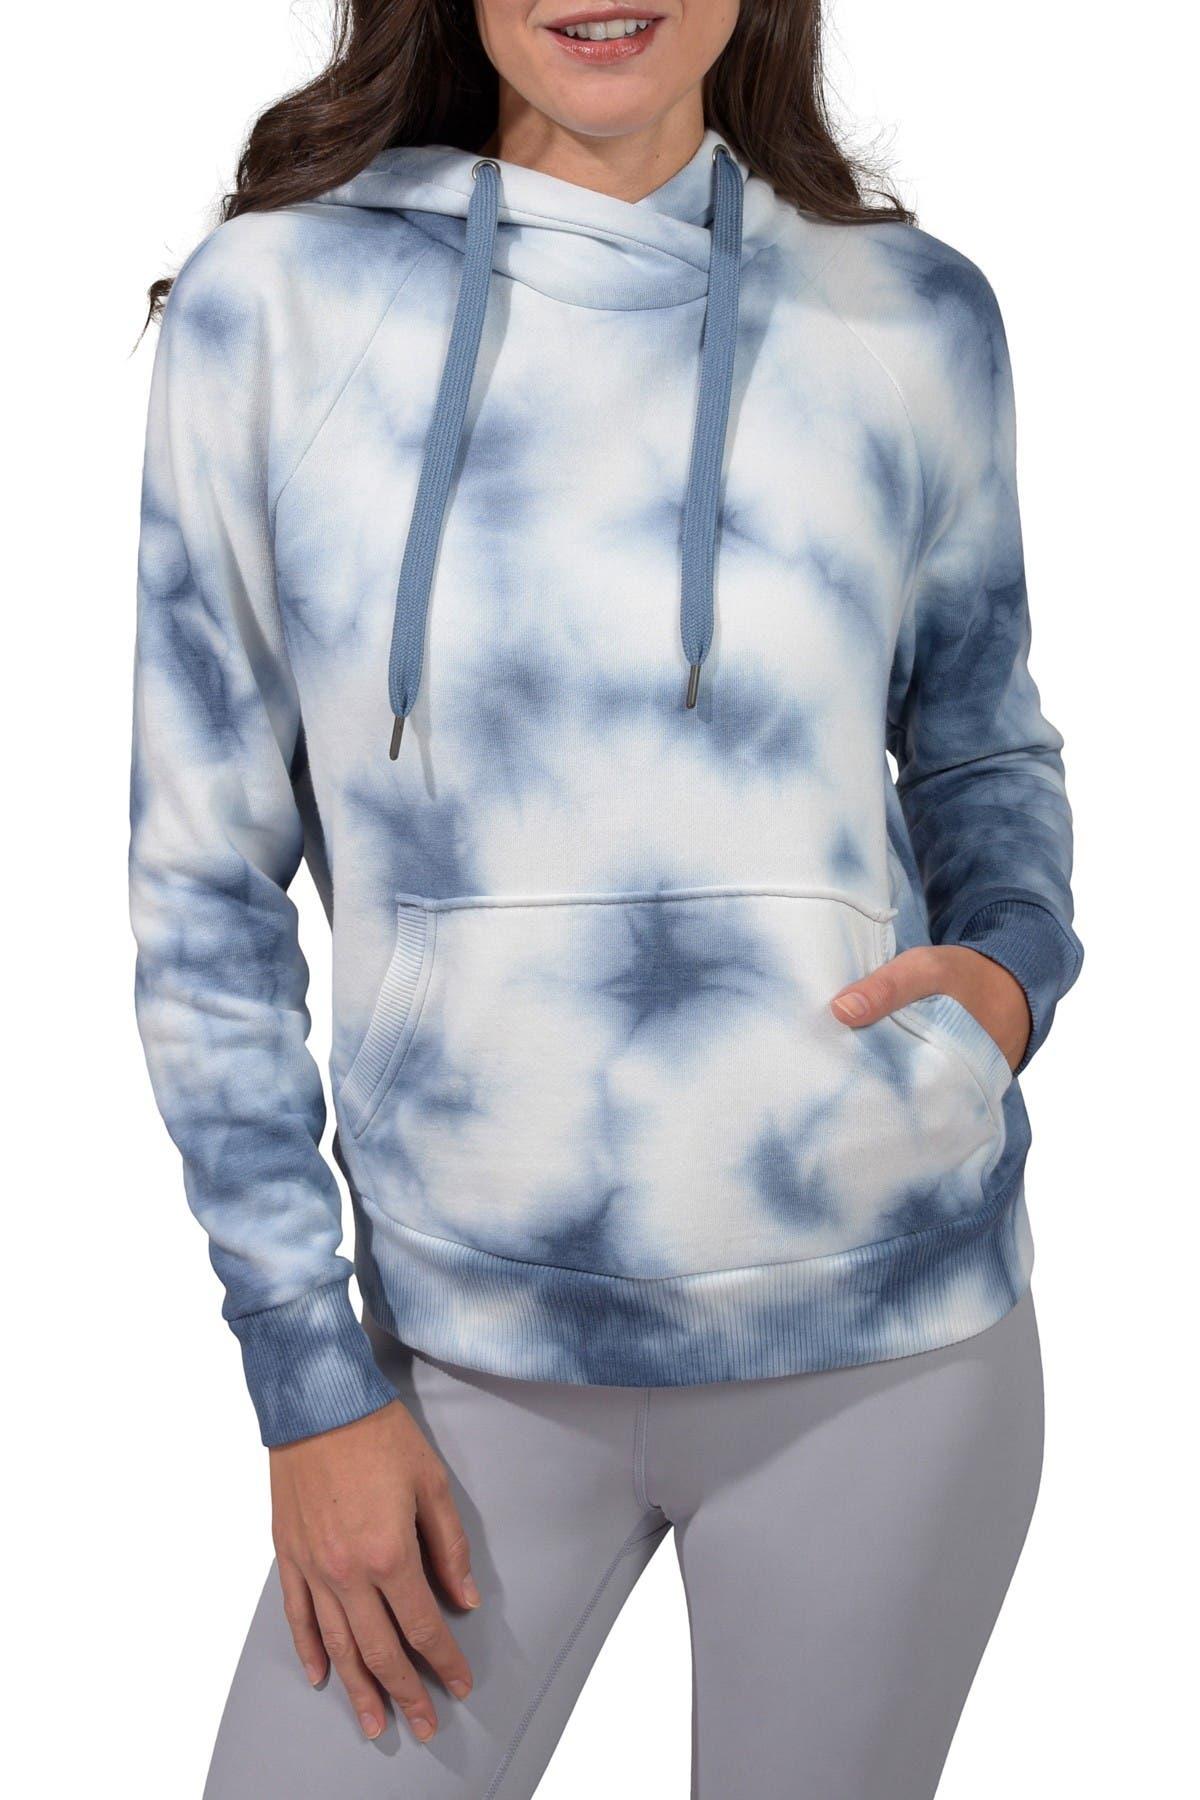 Image of 90 Degree By Reflex Brushed Knit Tie Dye Cross Neck Oversized Hoodie